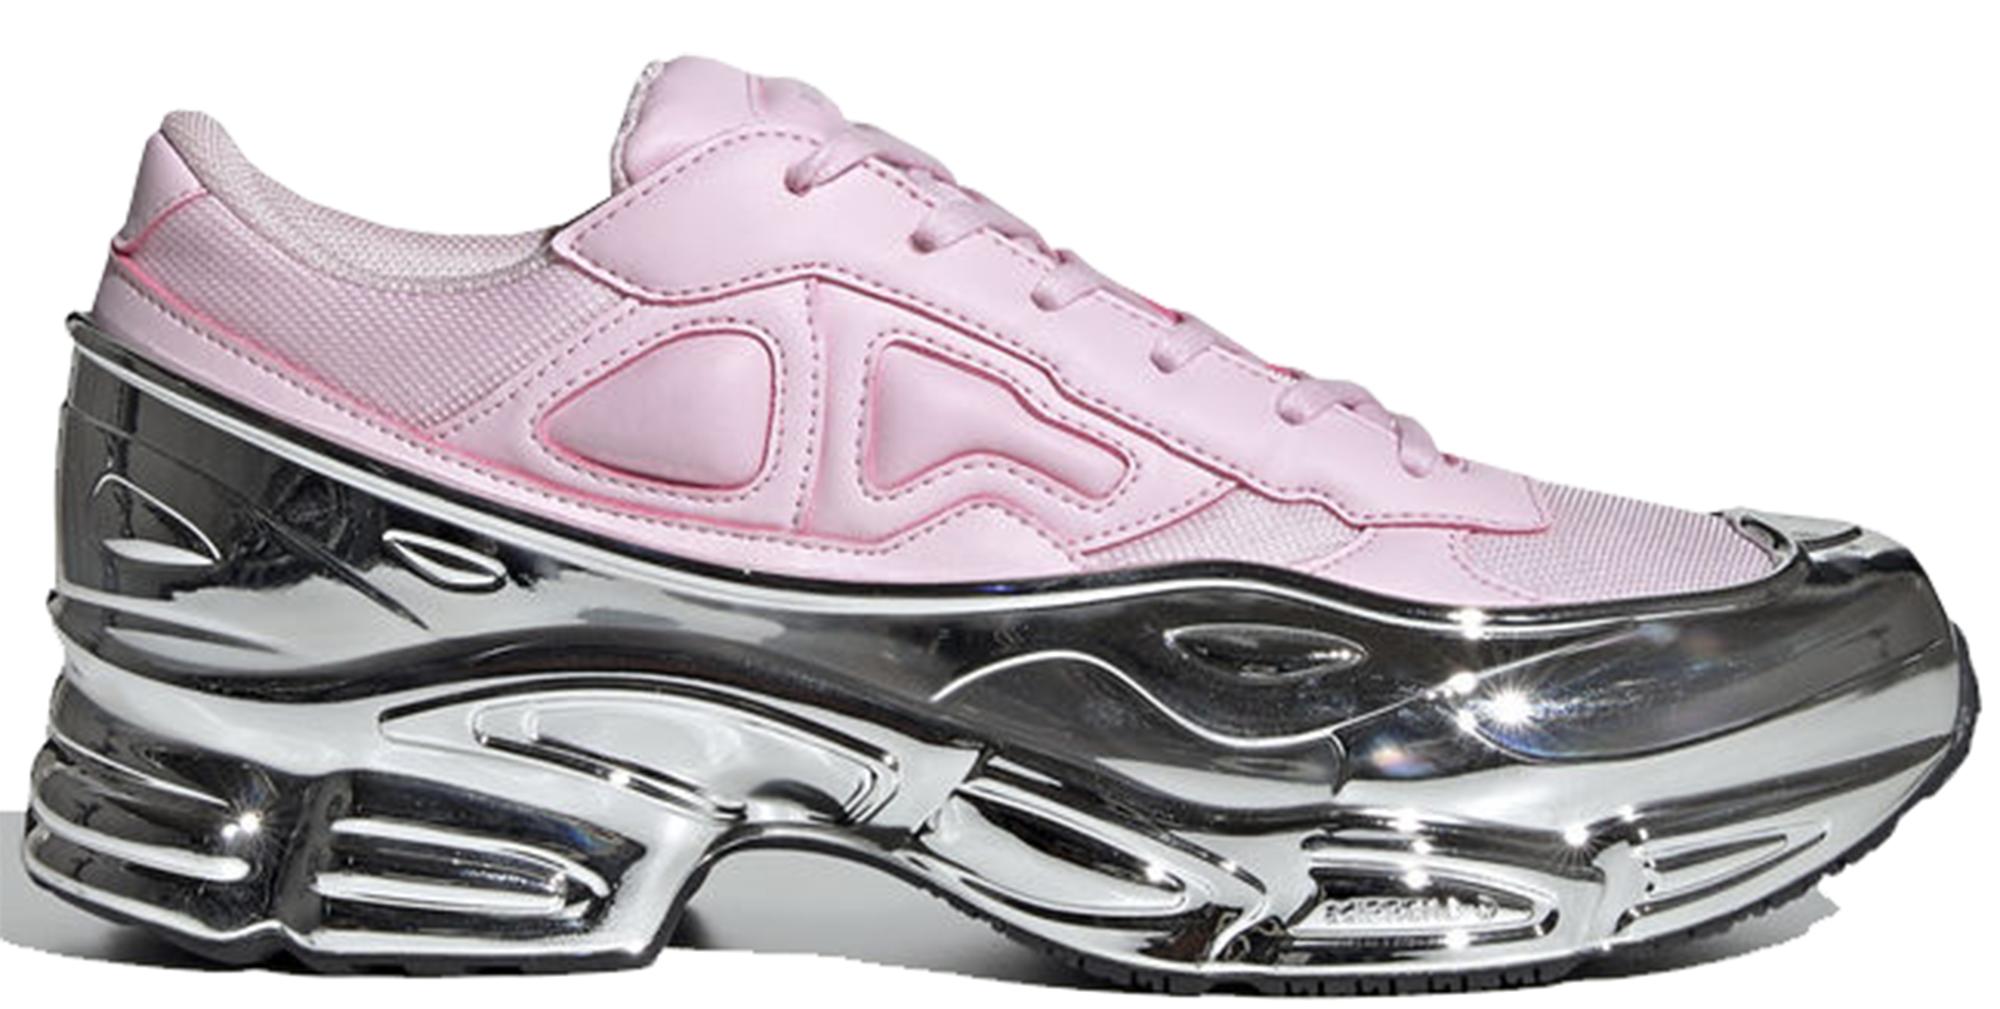 adidas Ozweego Raf Simons Clear Pink Silver Metallic